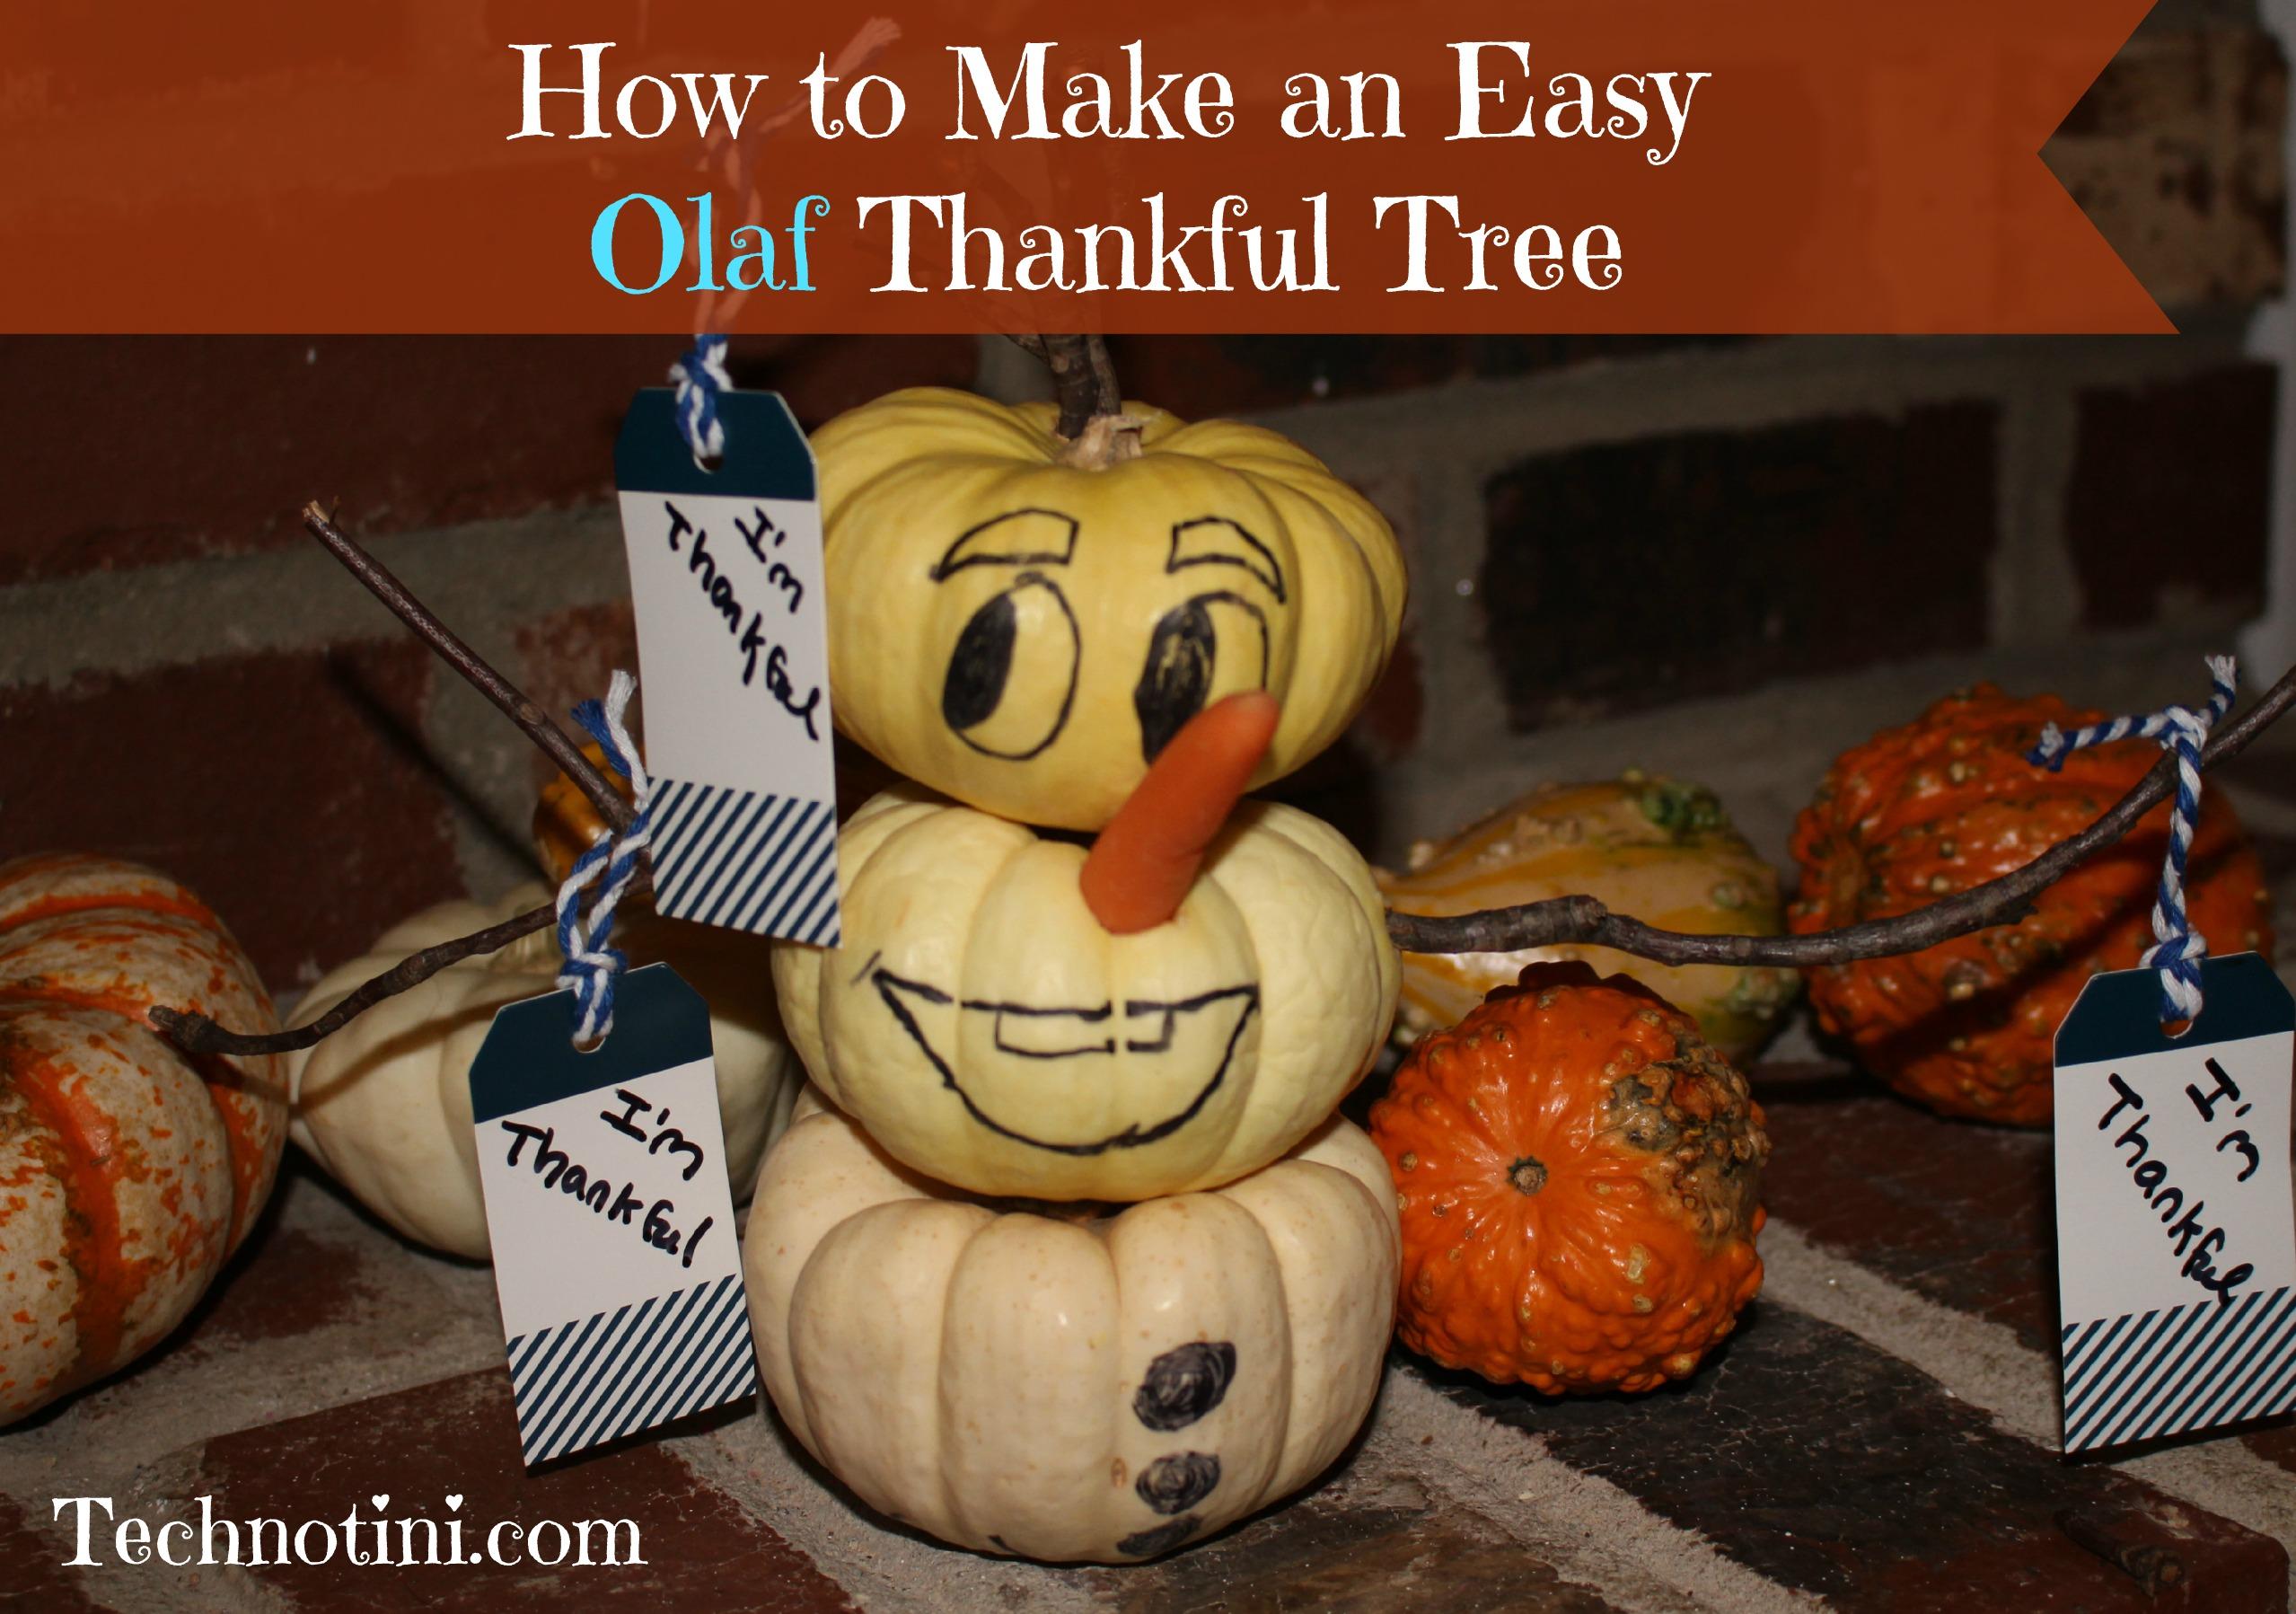 How to Make an Easy Olaf Thankful Tree - Technotini